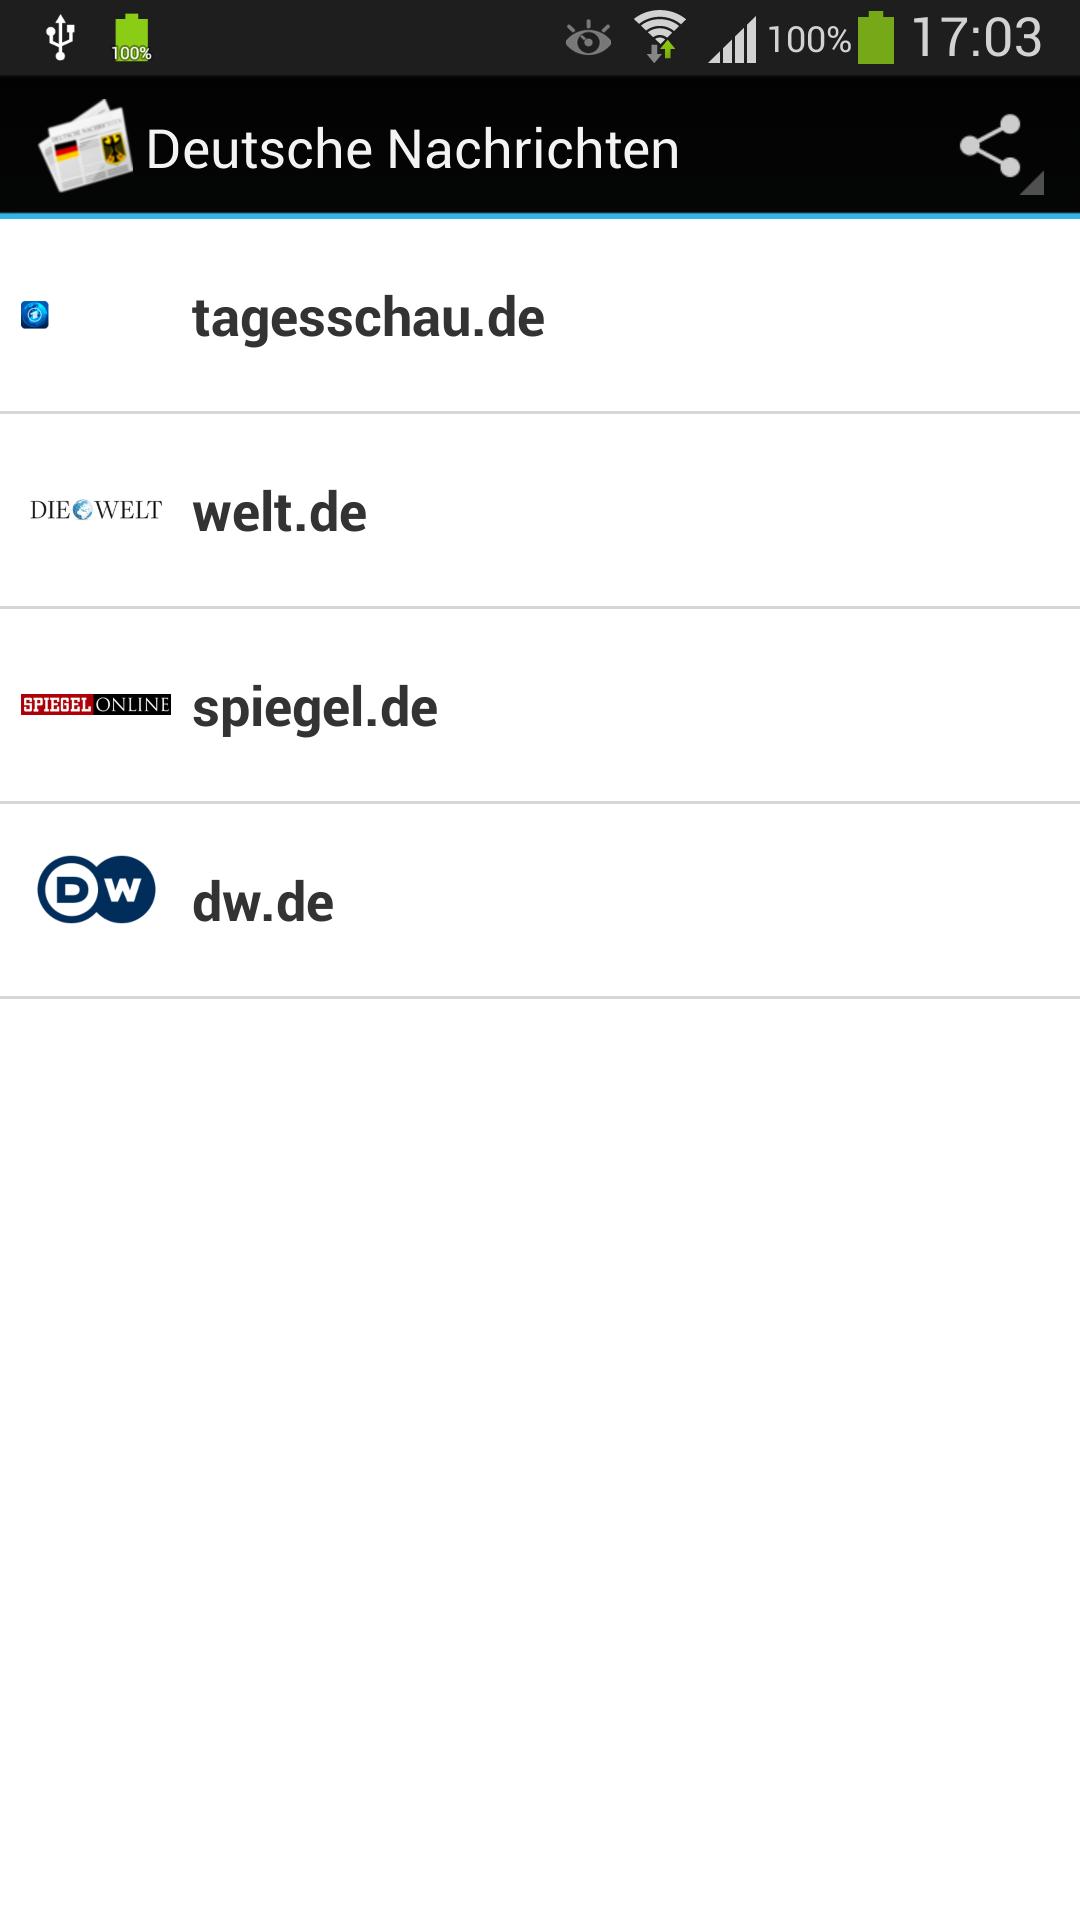 Deutsche narichten Screenshot